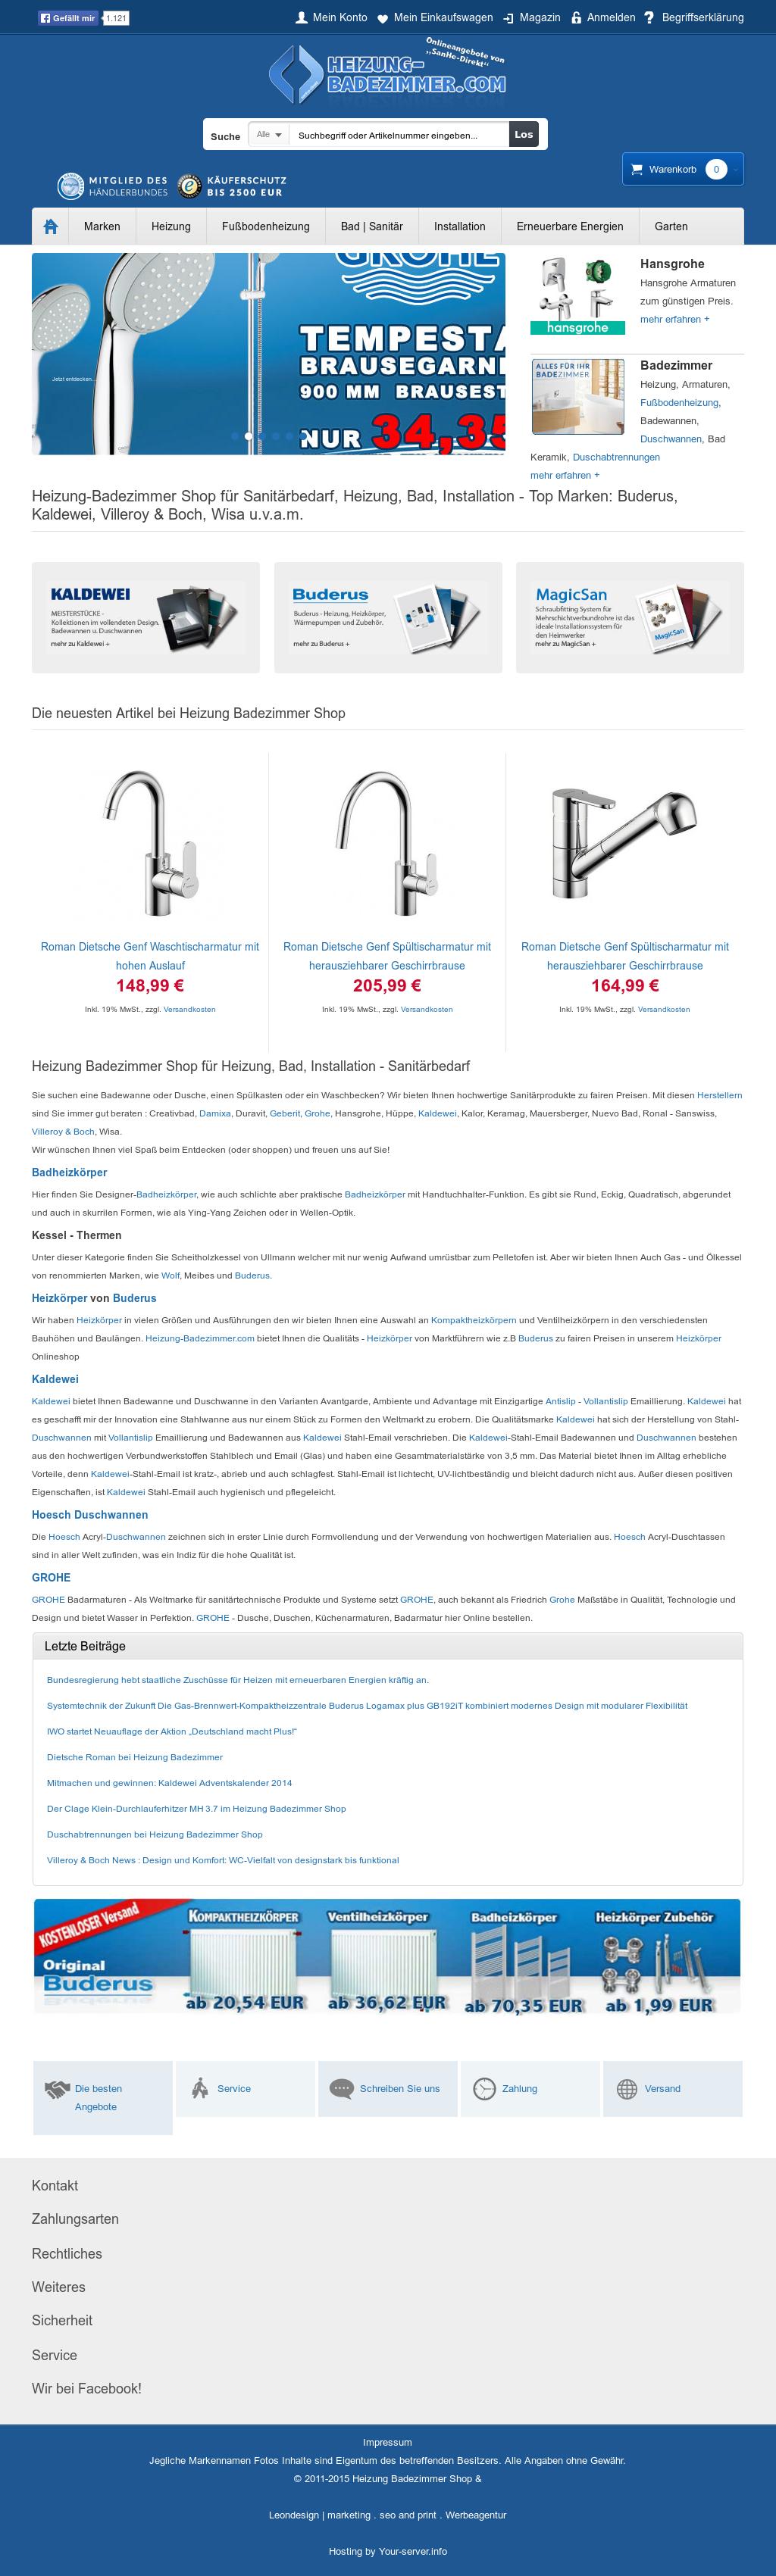 Heizung Für Badezimmer   Heizung Badezimmer Competitors Revenue And Employees Owler